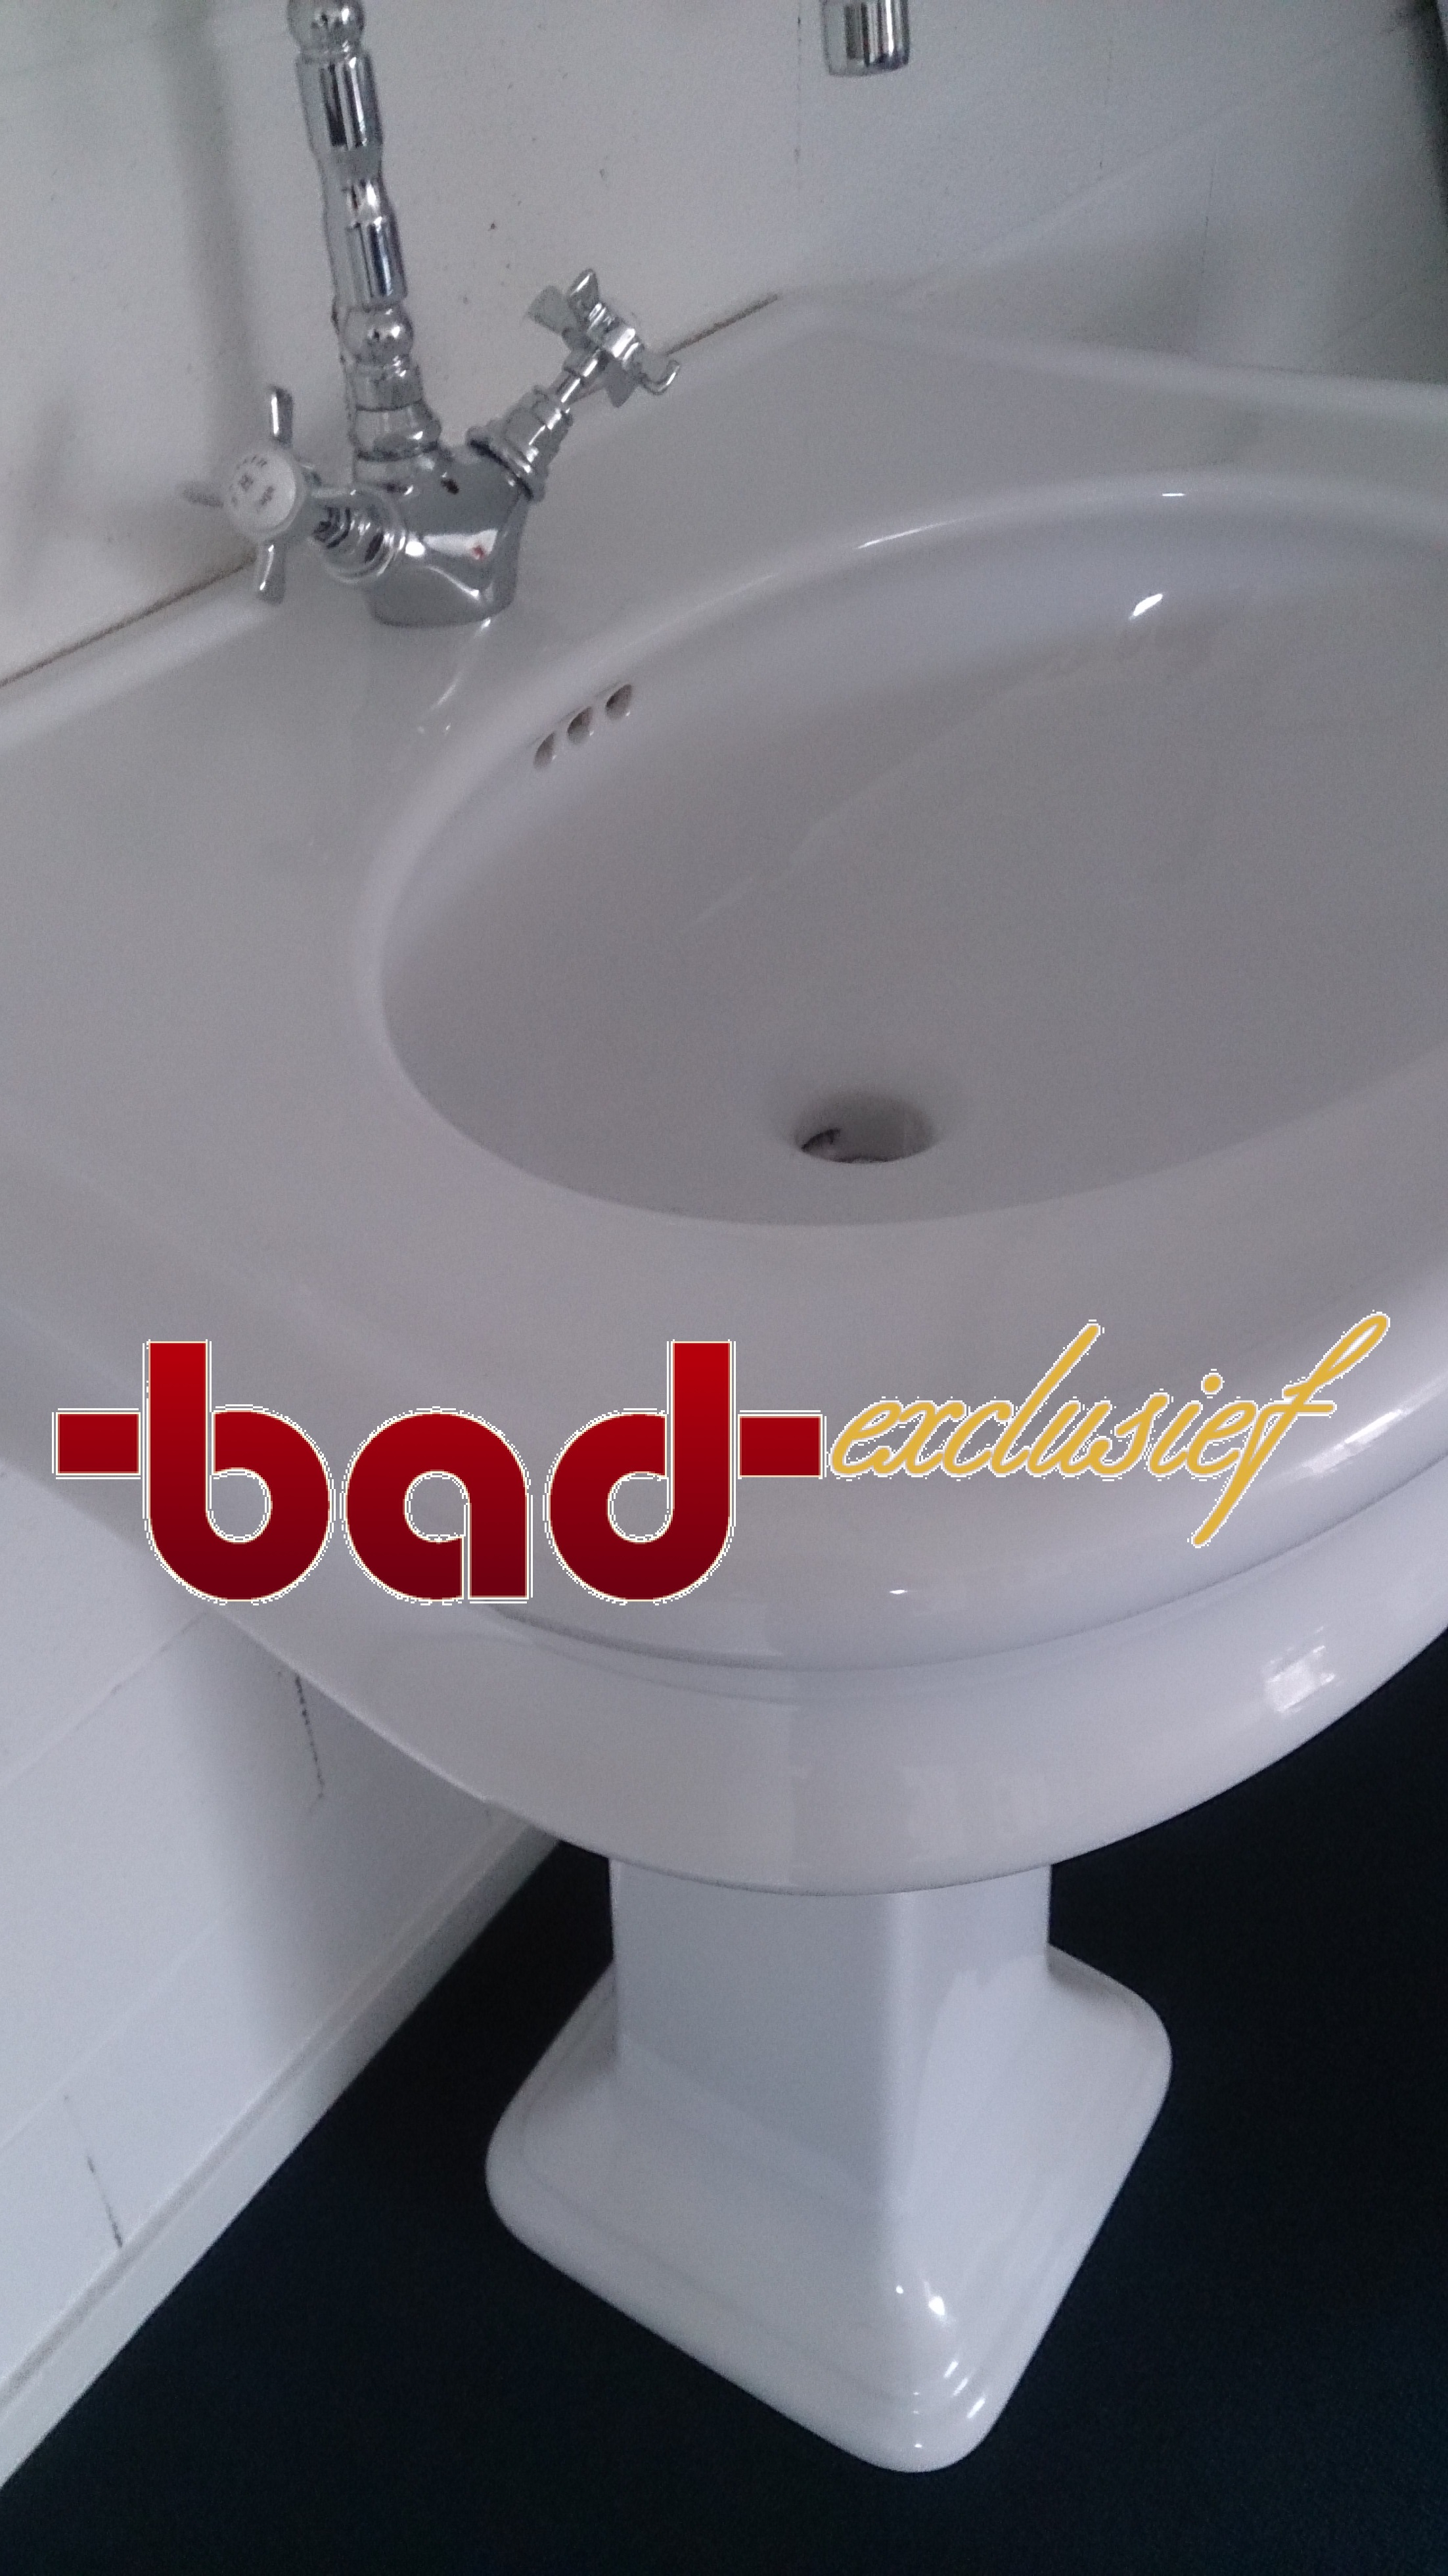 macbath badexclusief groningen simas luxe sanitair